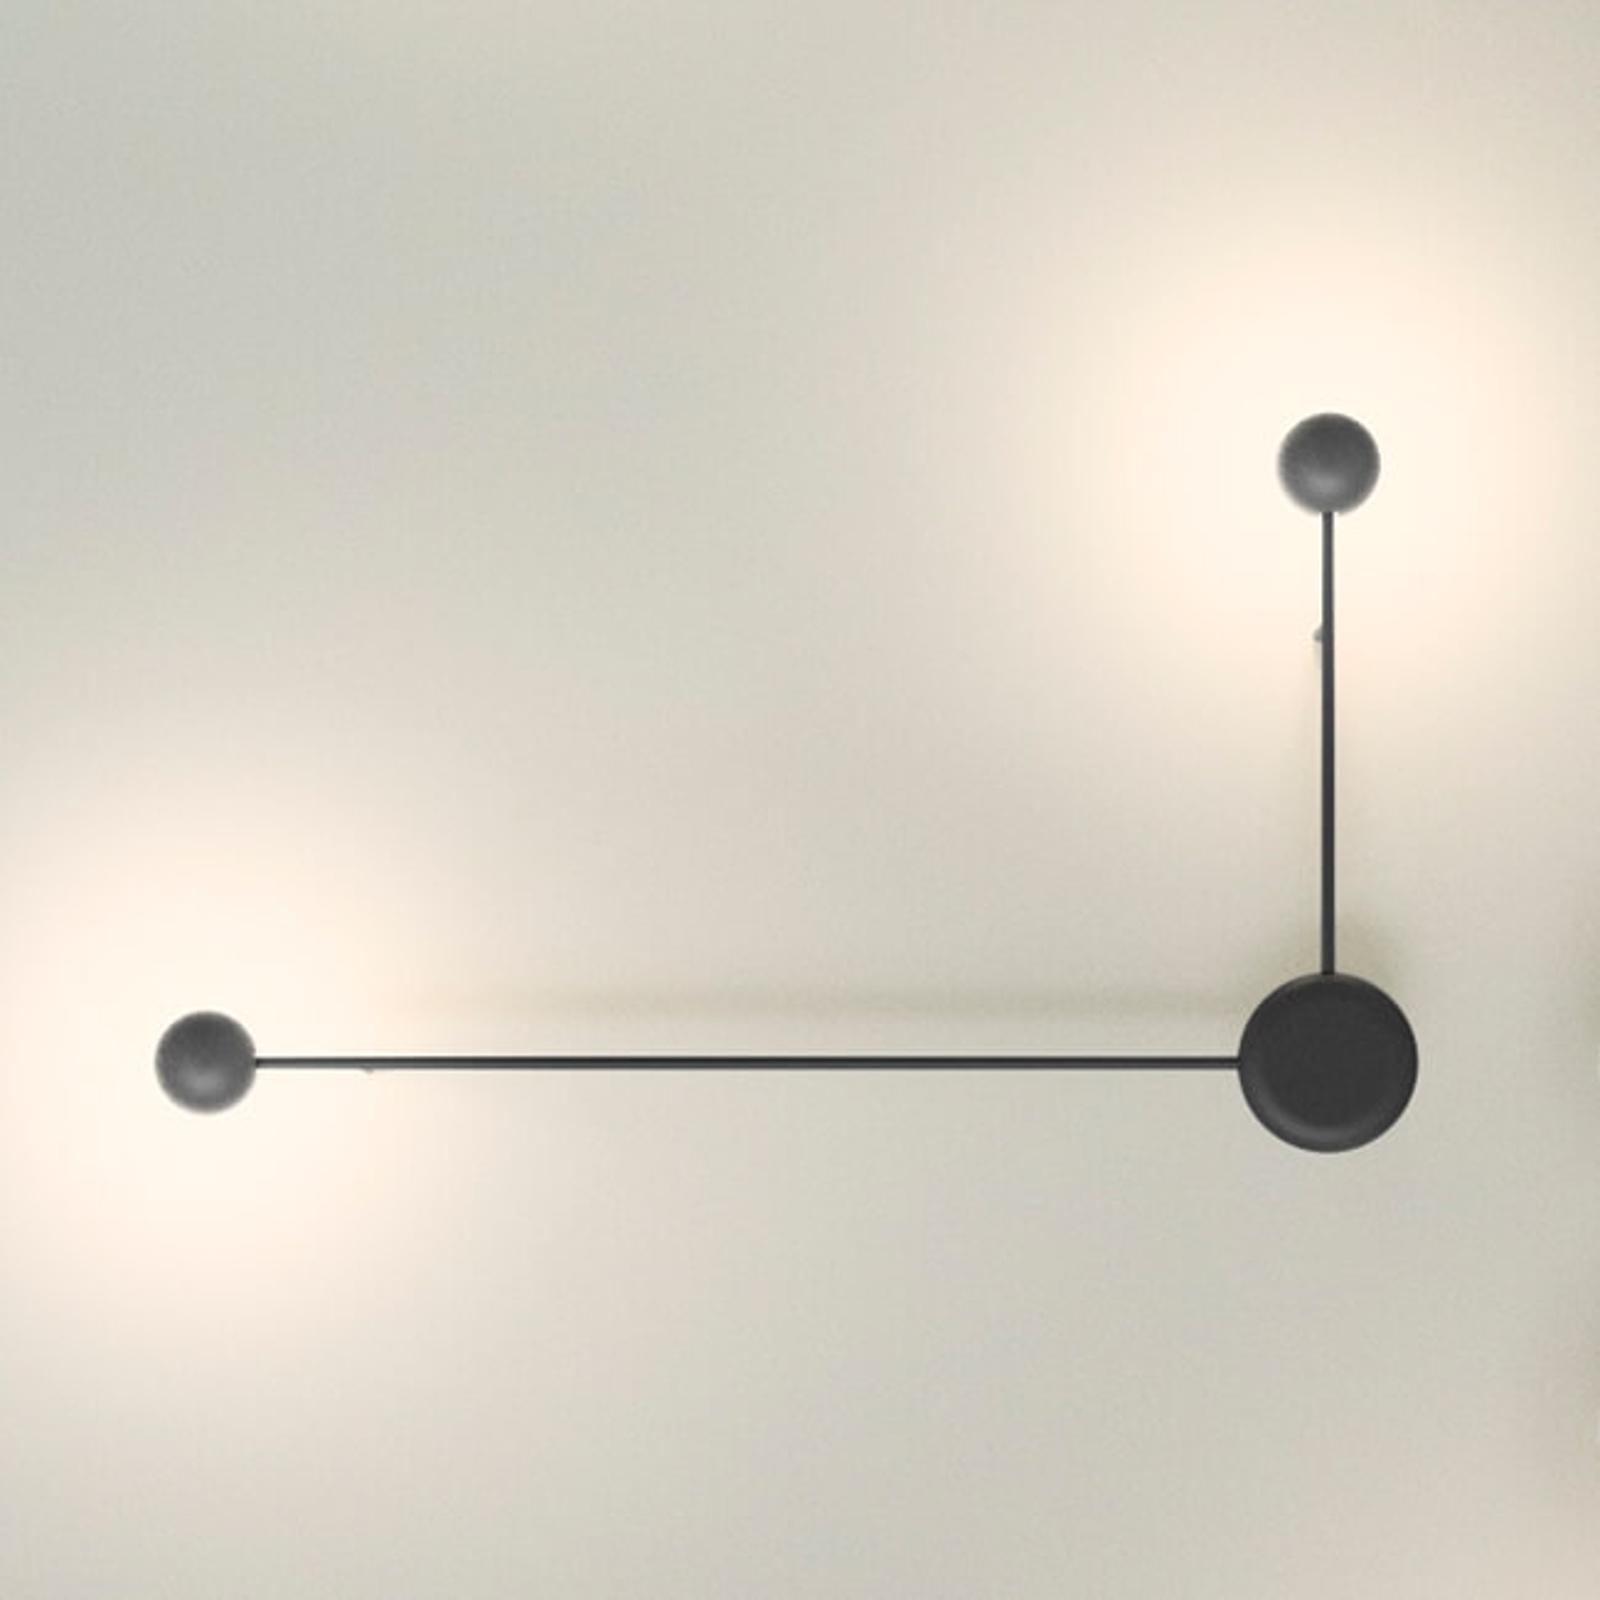 Vibia Pin - 2-flammige LED-Wandleuchte schwarz